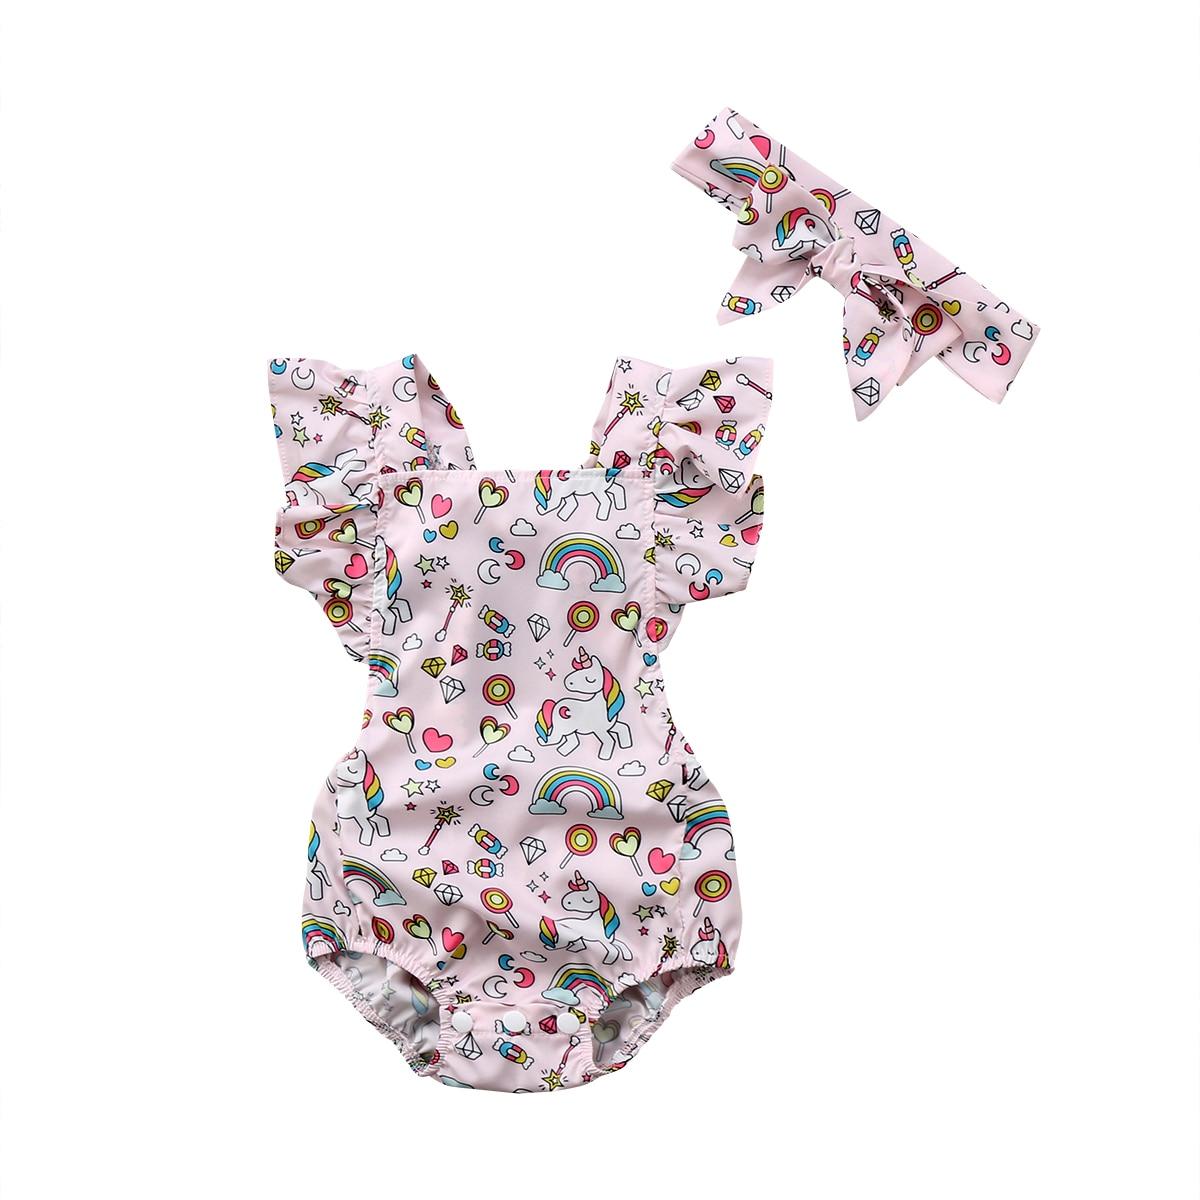 Cute Newborn Baby Girl Cartoon Animal Romper Pants Headband Outfit Clothes Set